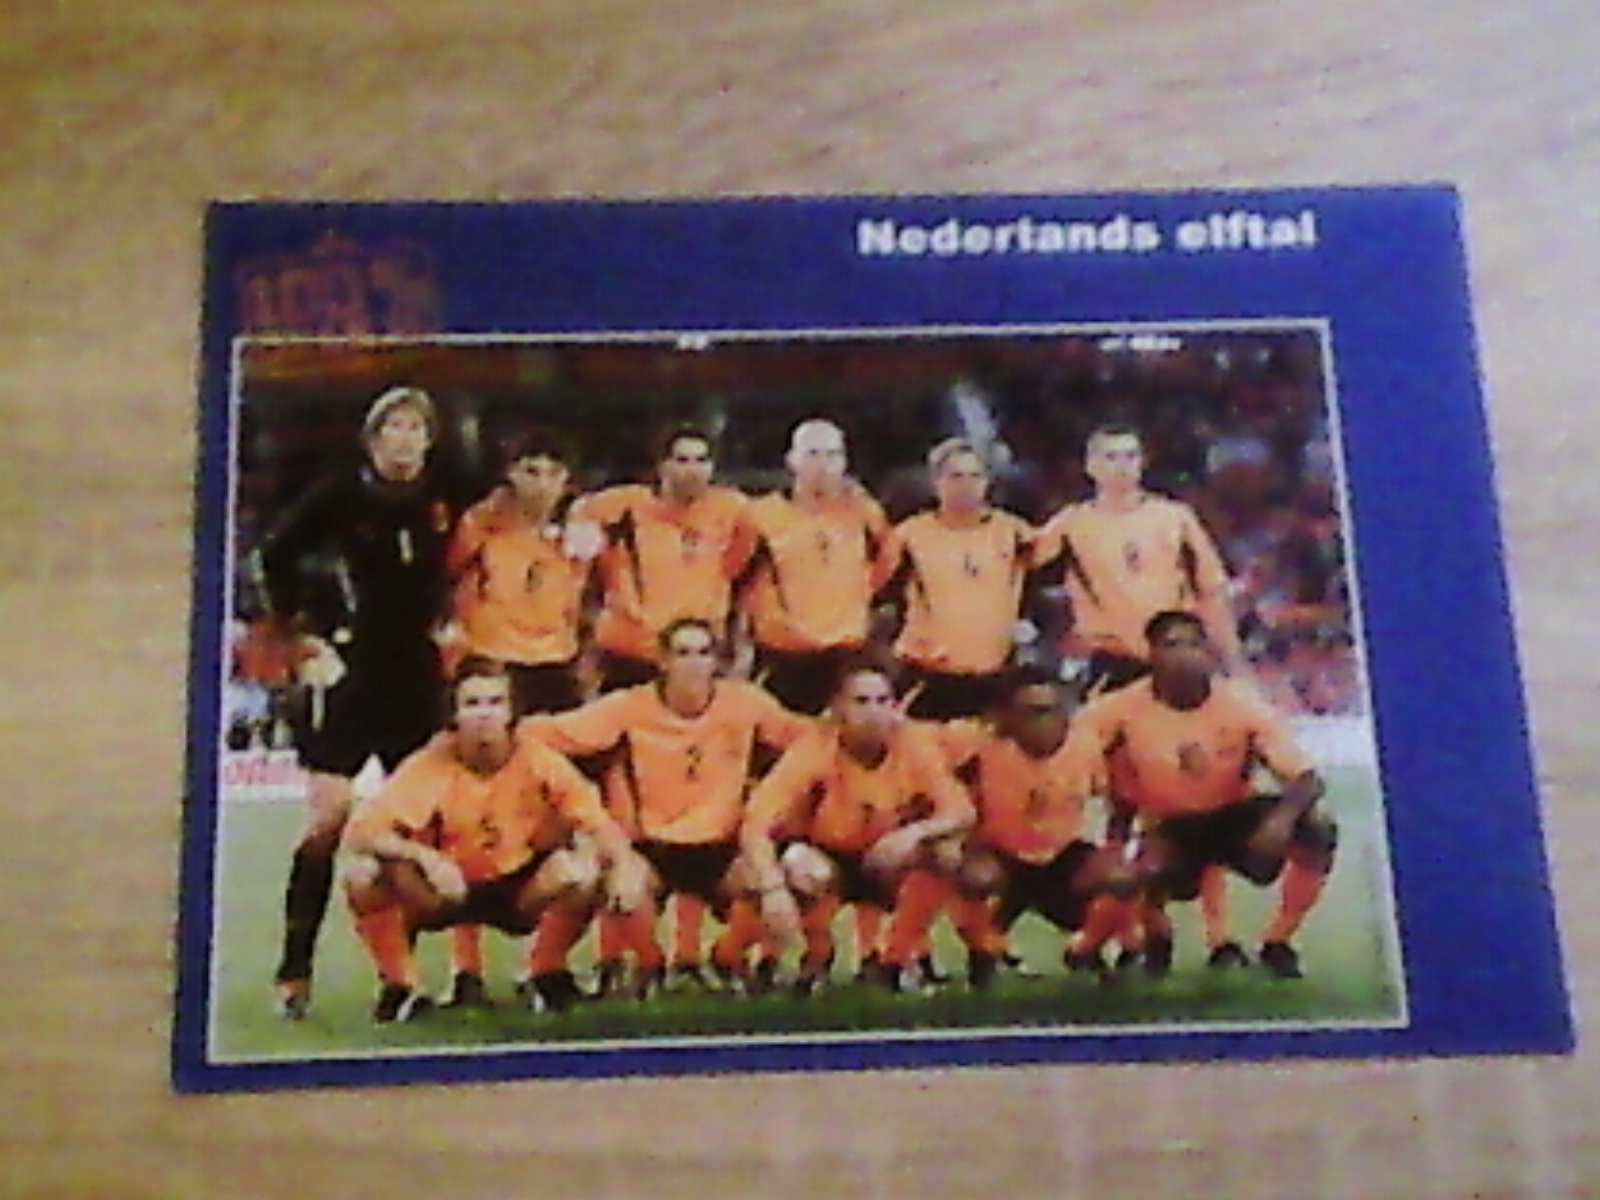 Piłka nożna - fotos zespołu Holandia